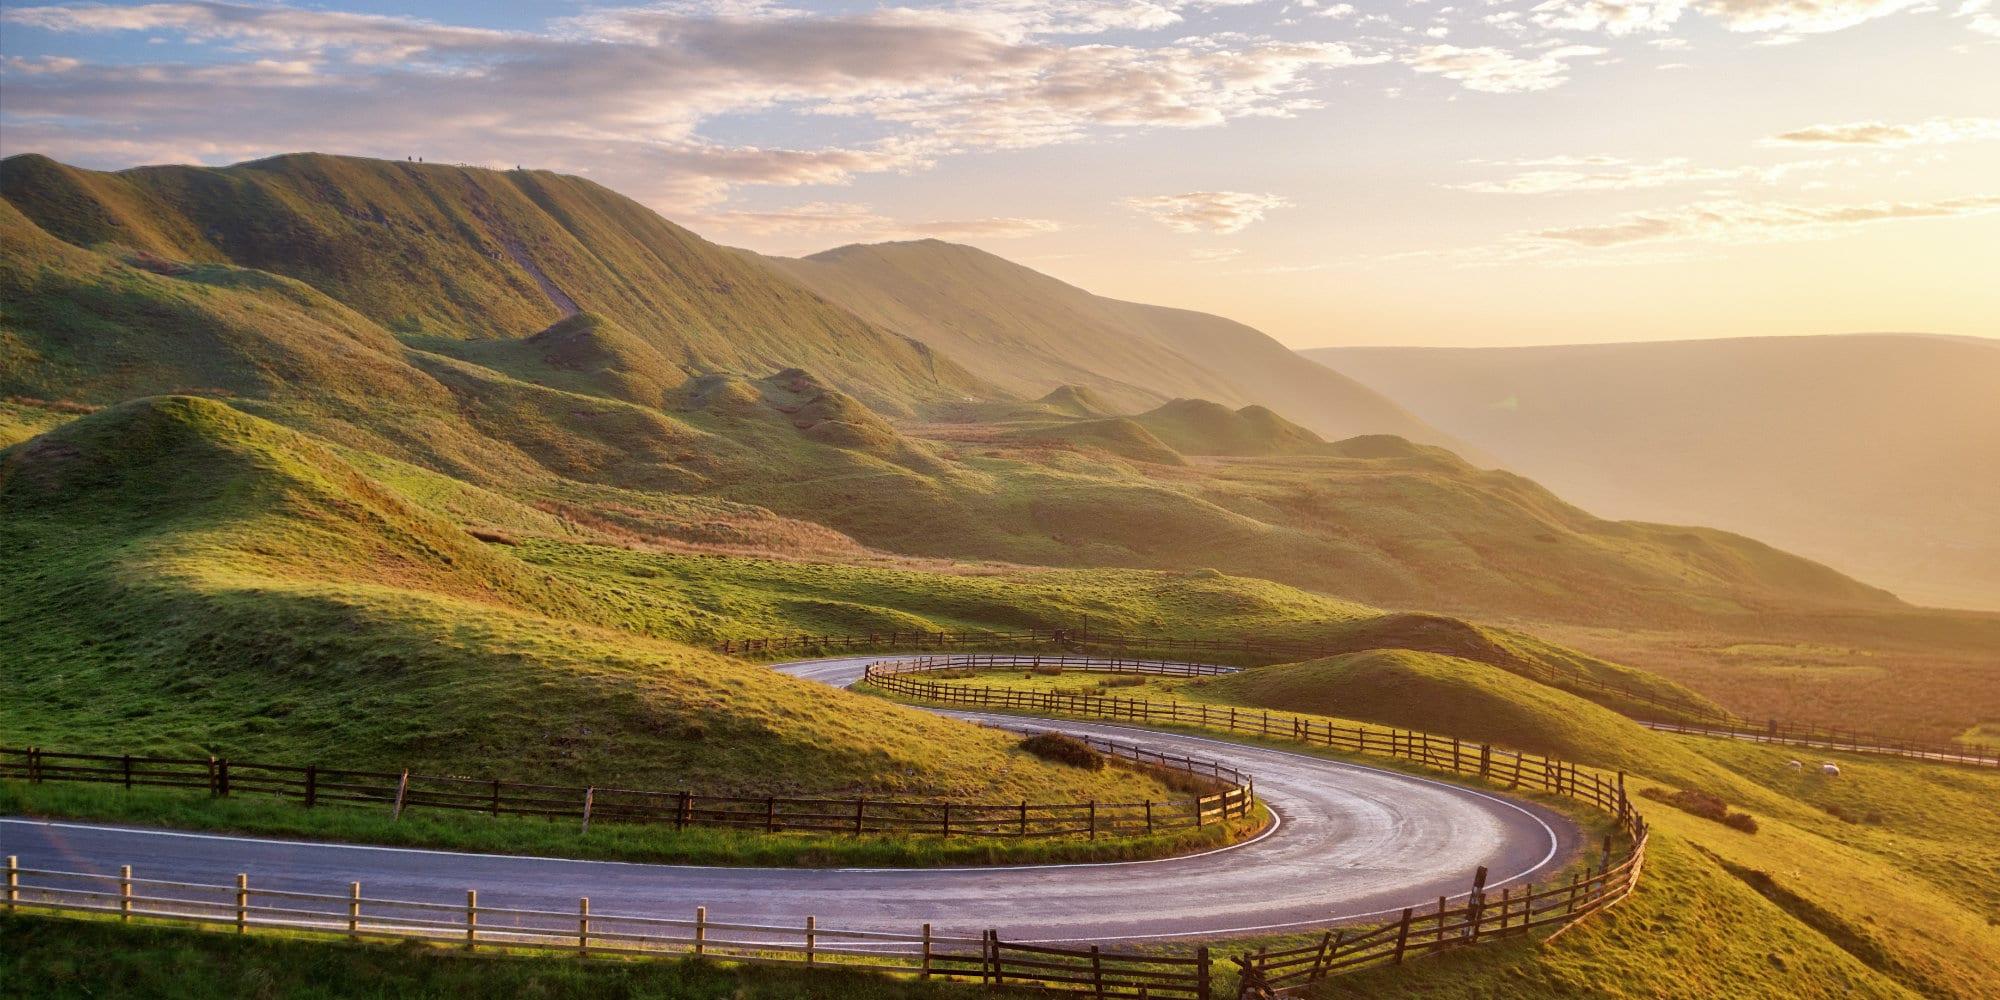 Sunset over Winnats Pass in Peak District United Kingdom